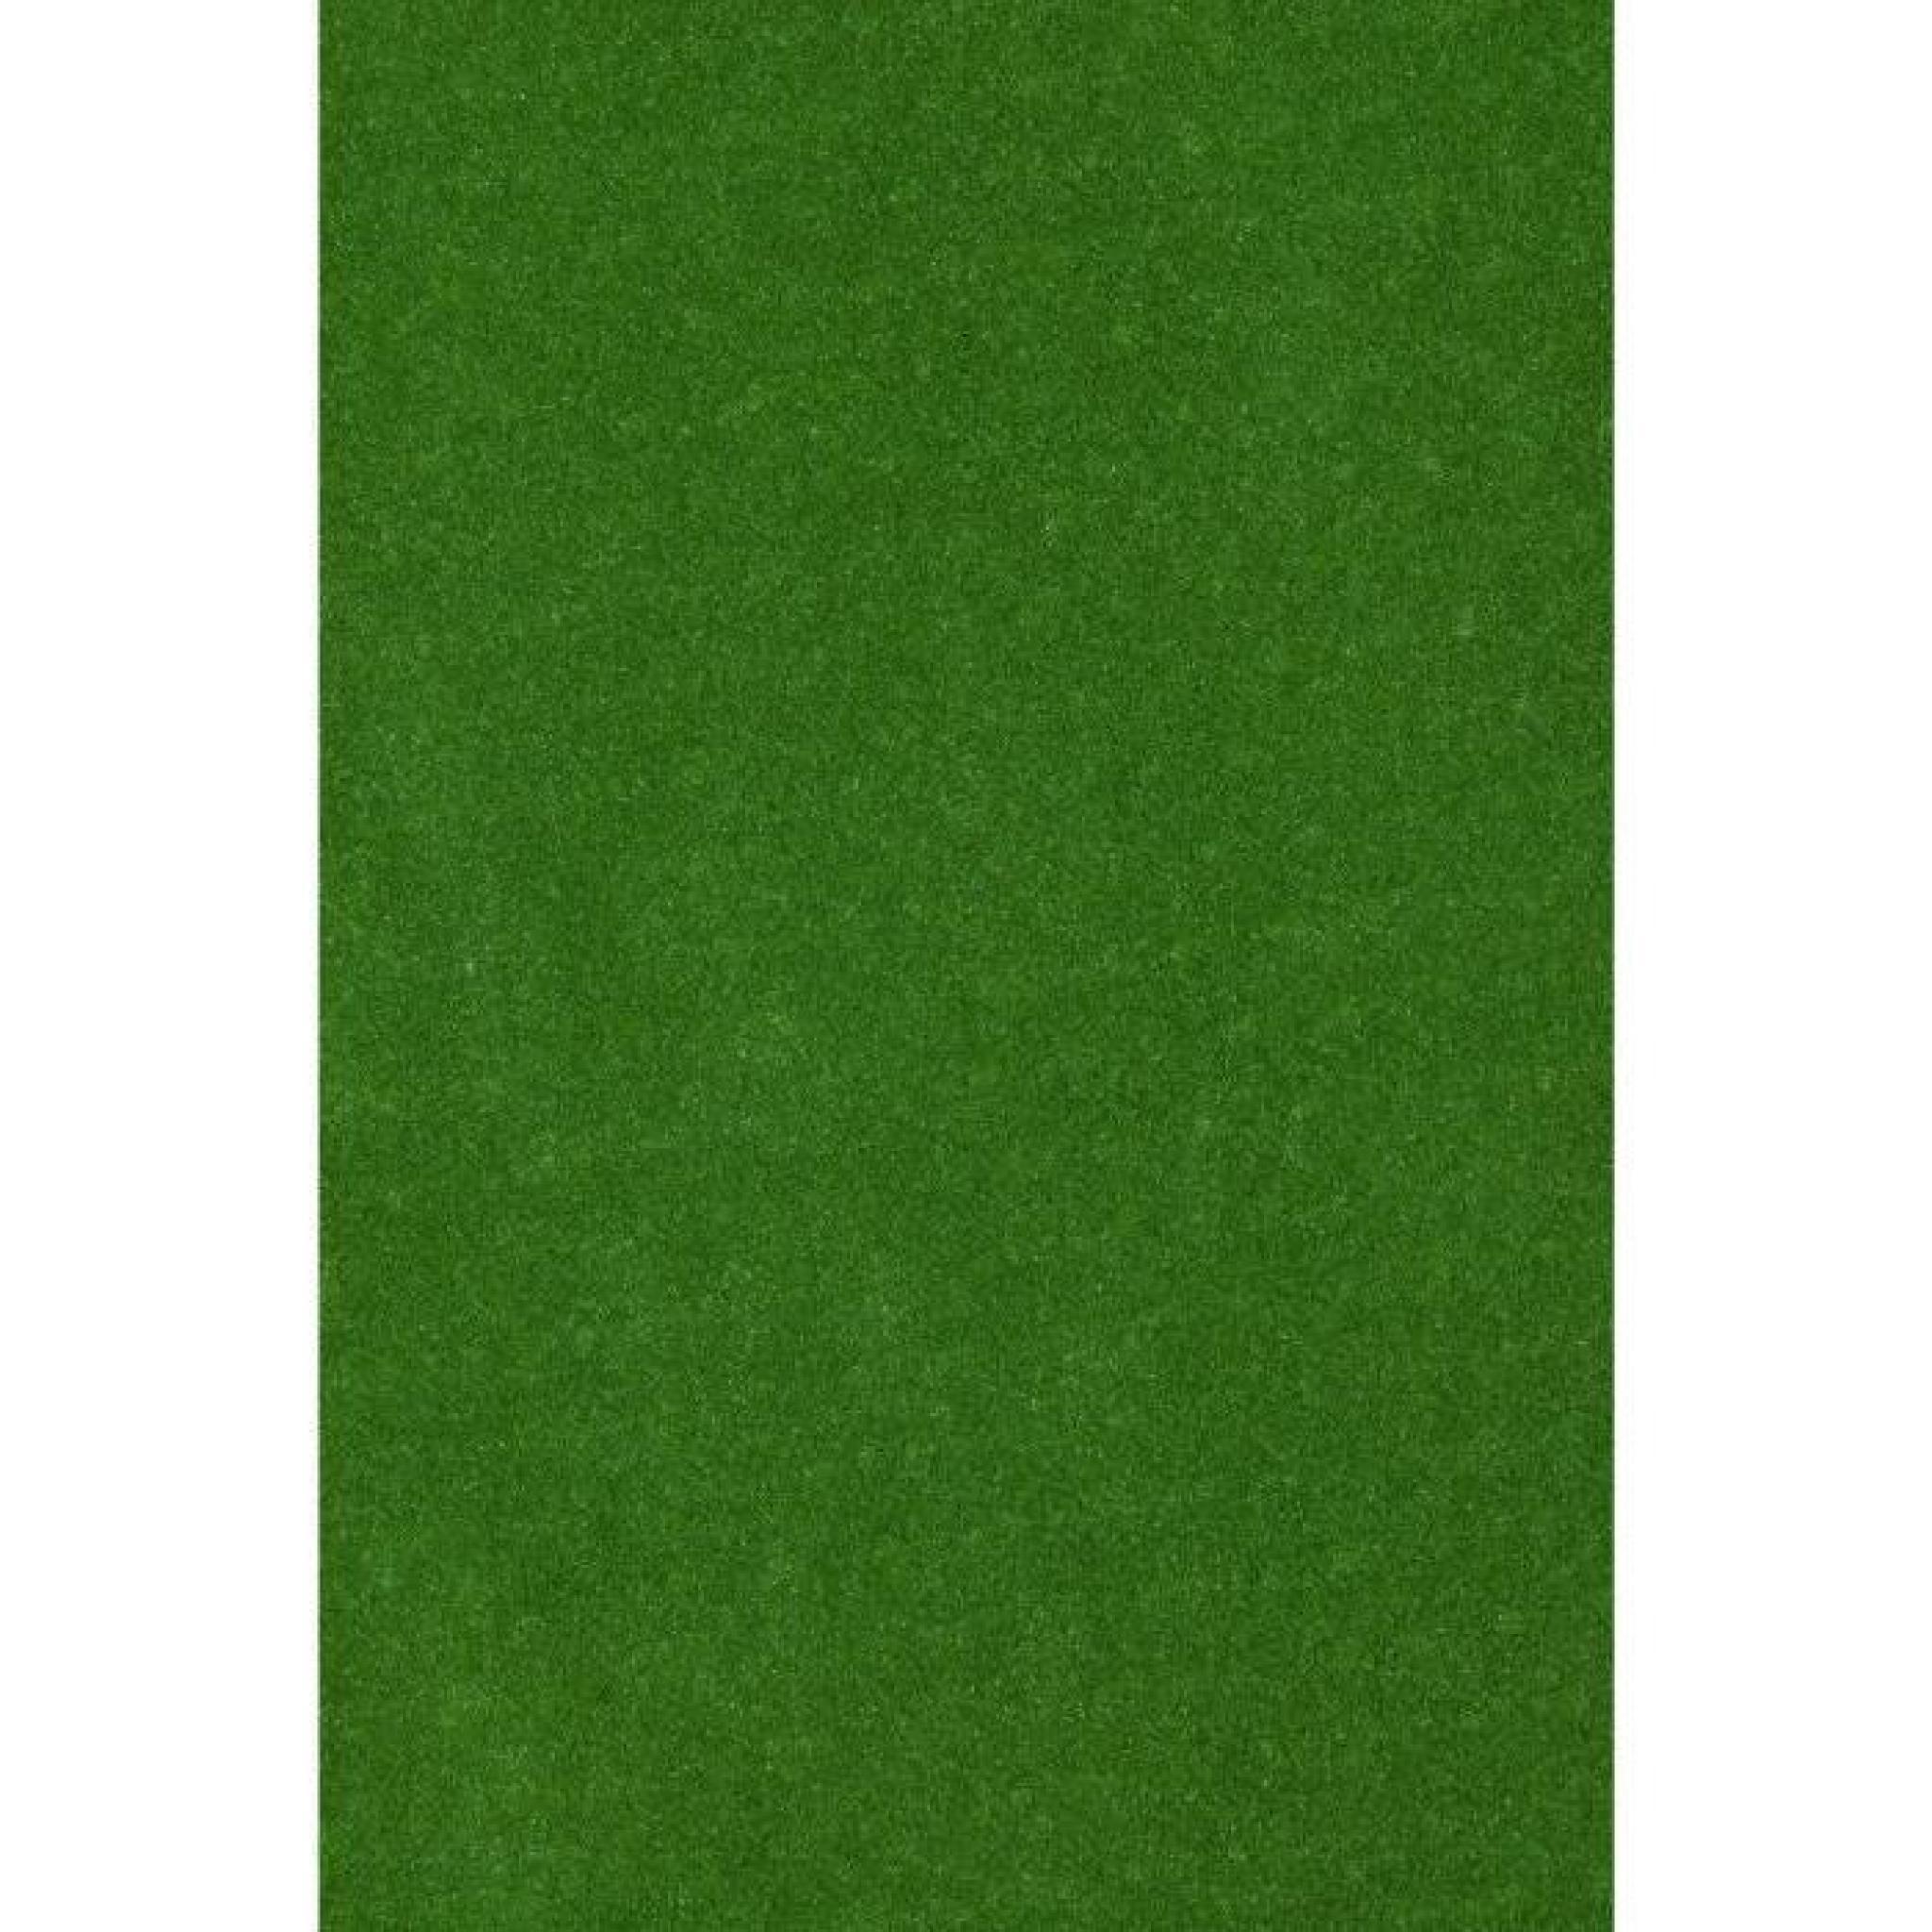 Exelgreen Moquette Imitation Gazon Synthétique Primo 5mm 1x4m